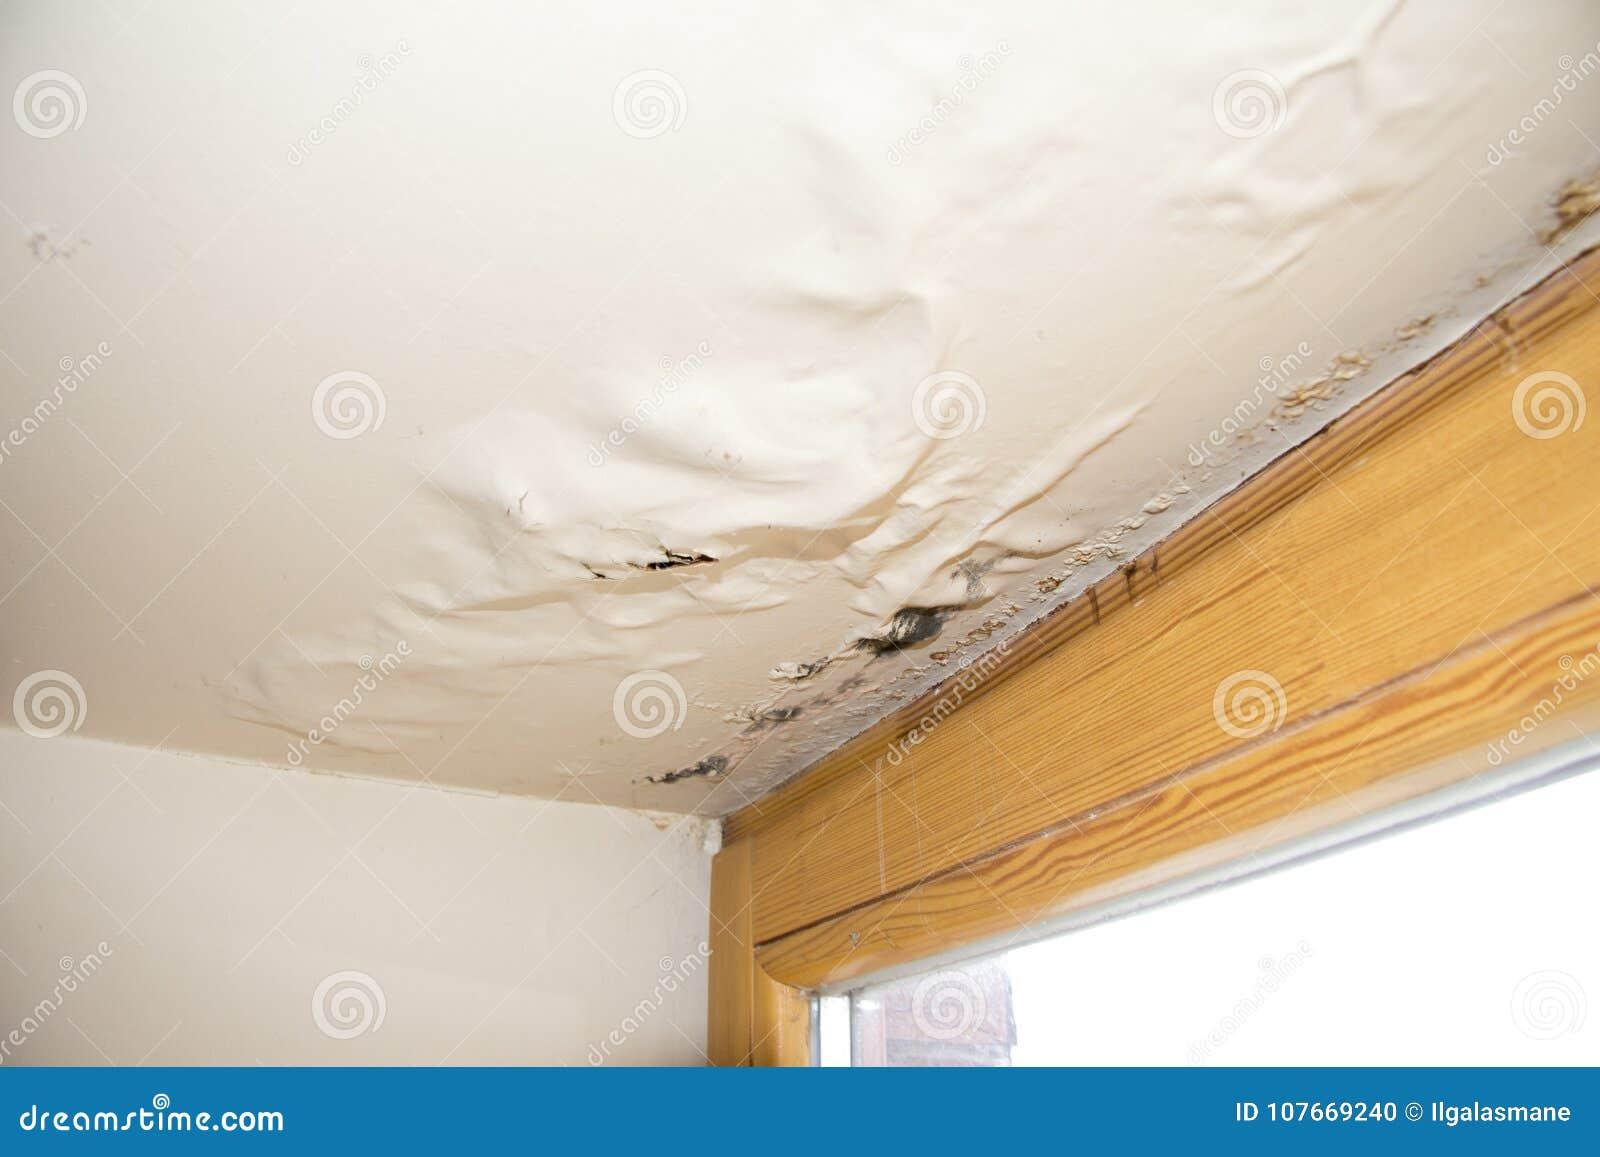 Вода, влага повредила потолок рядом с окном